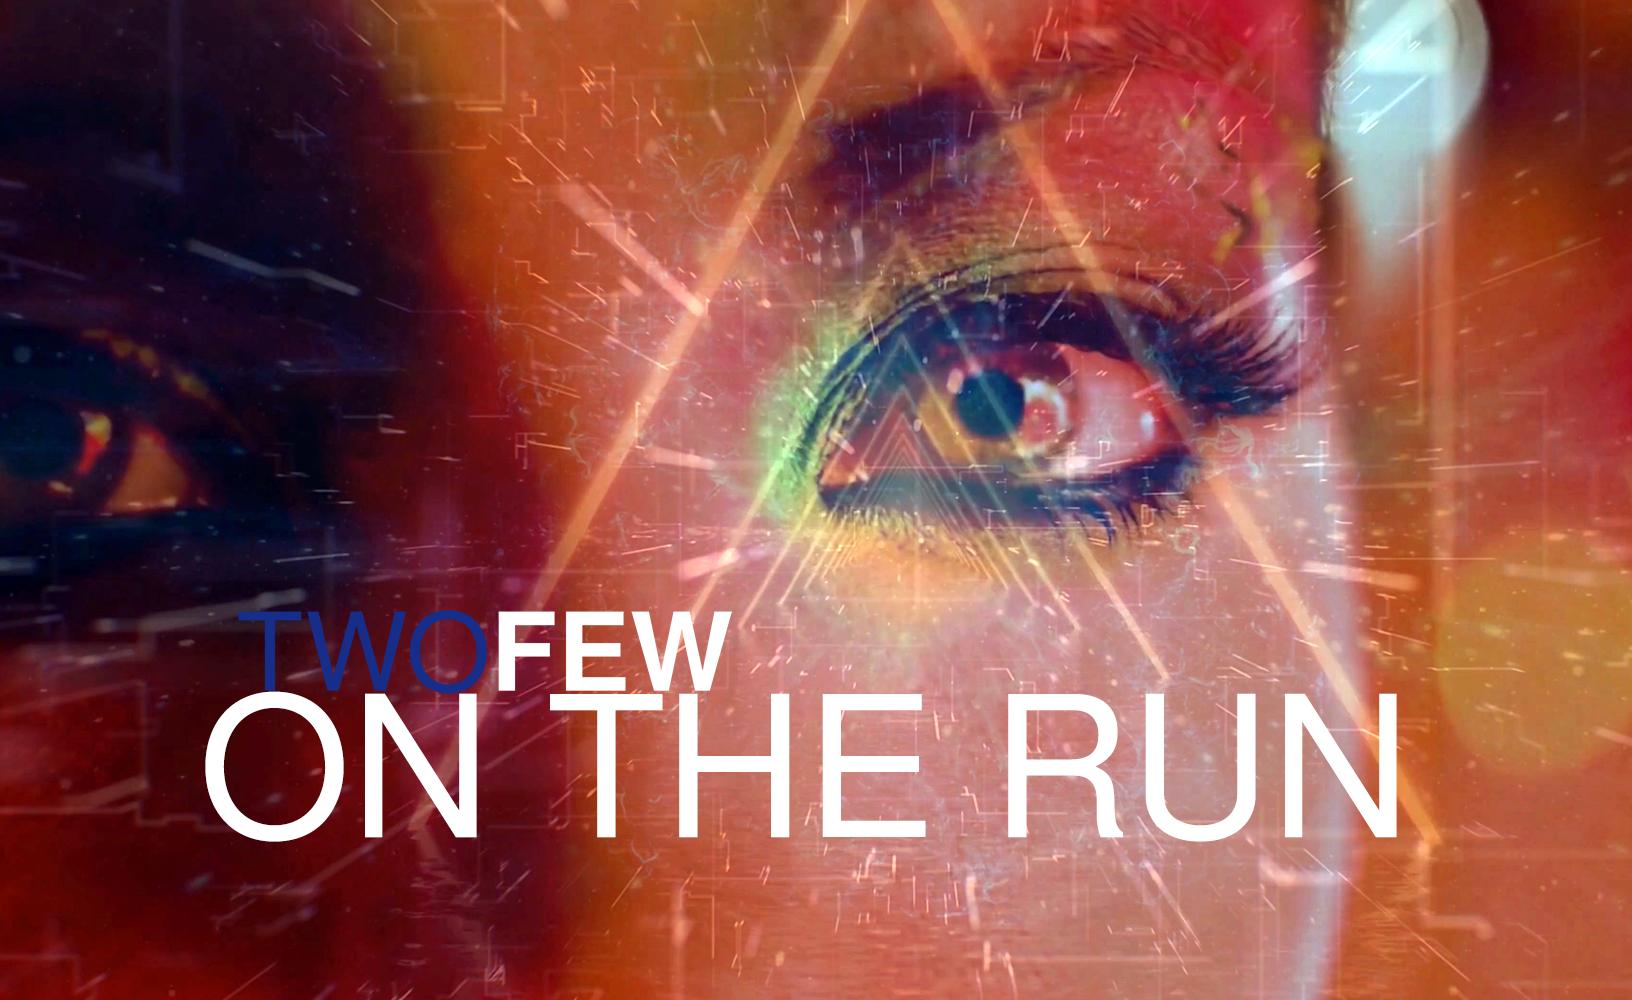 TWOFEW - ON THE RUN  - FOR KESOS